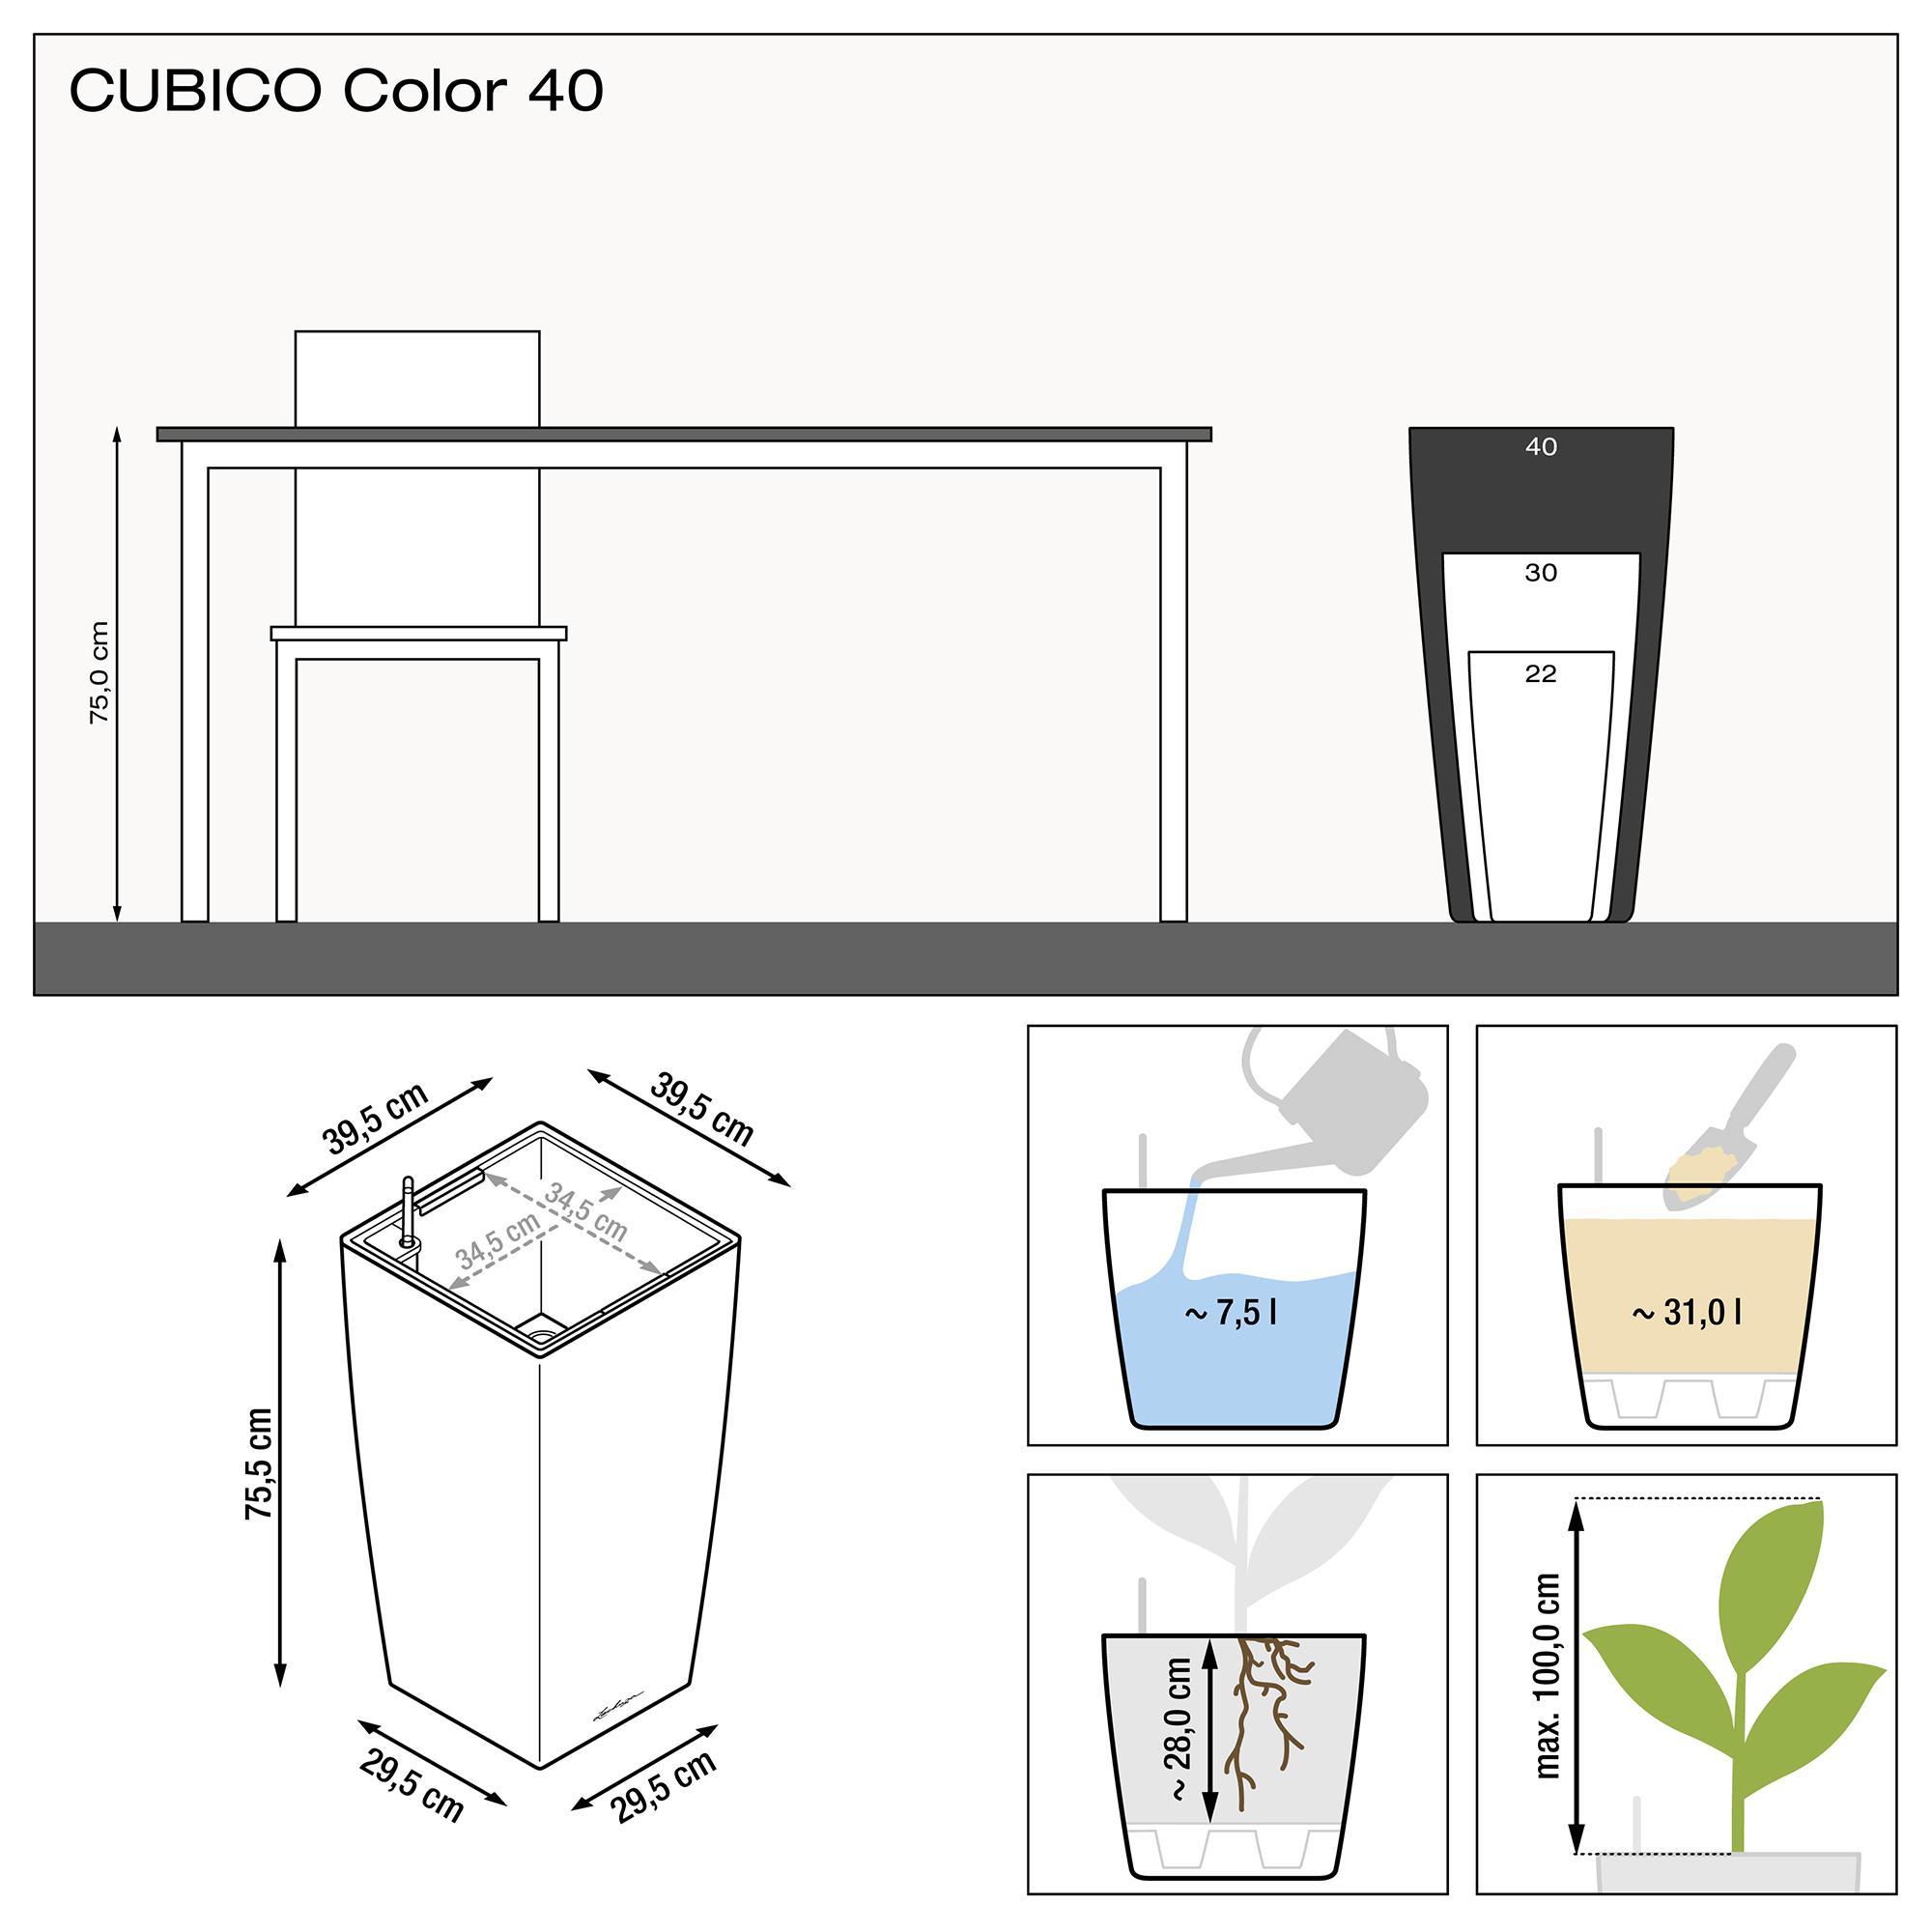 le_cubico-color40_product_addi_nz